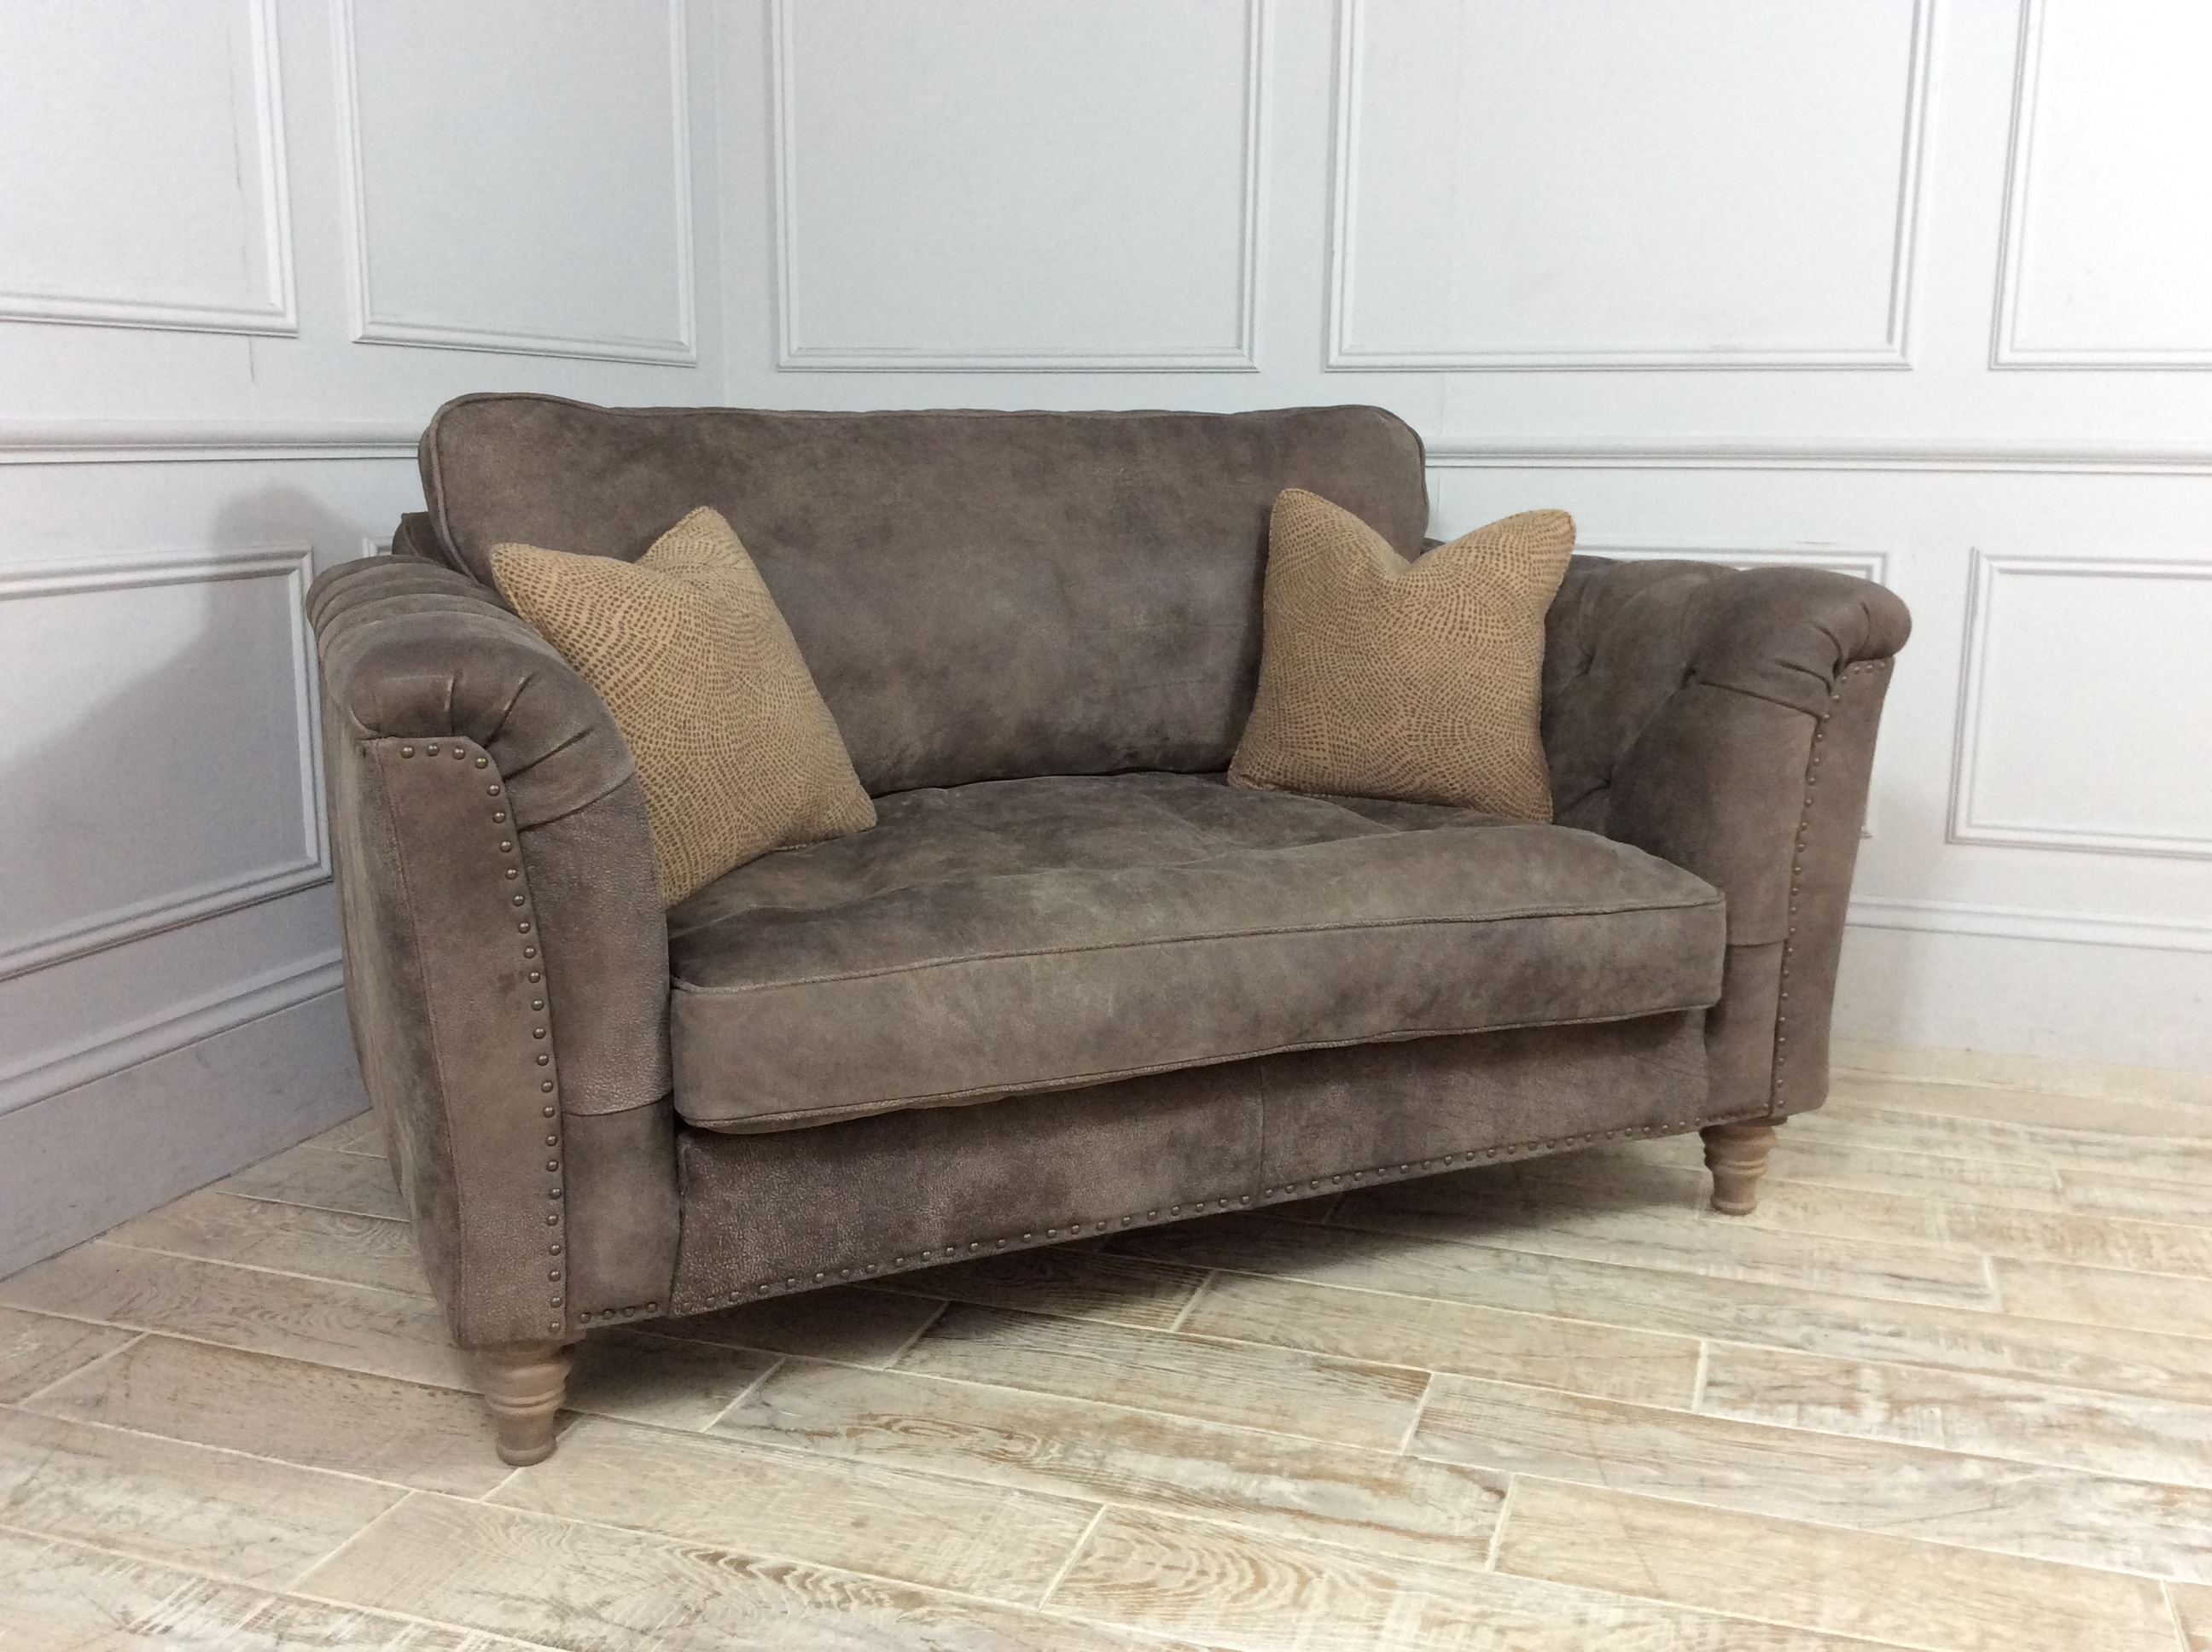 Dorset Loveseat Sofa in Buffed Elephant